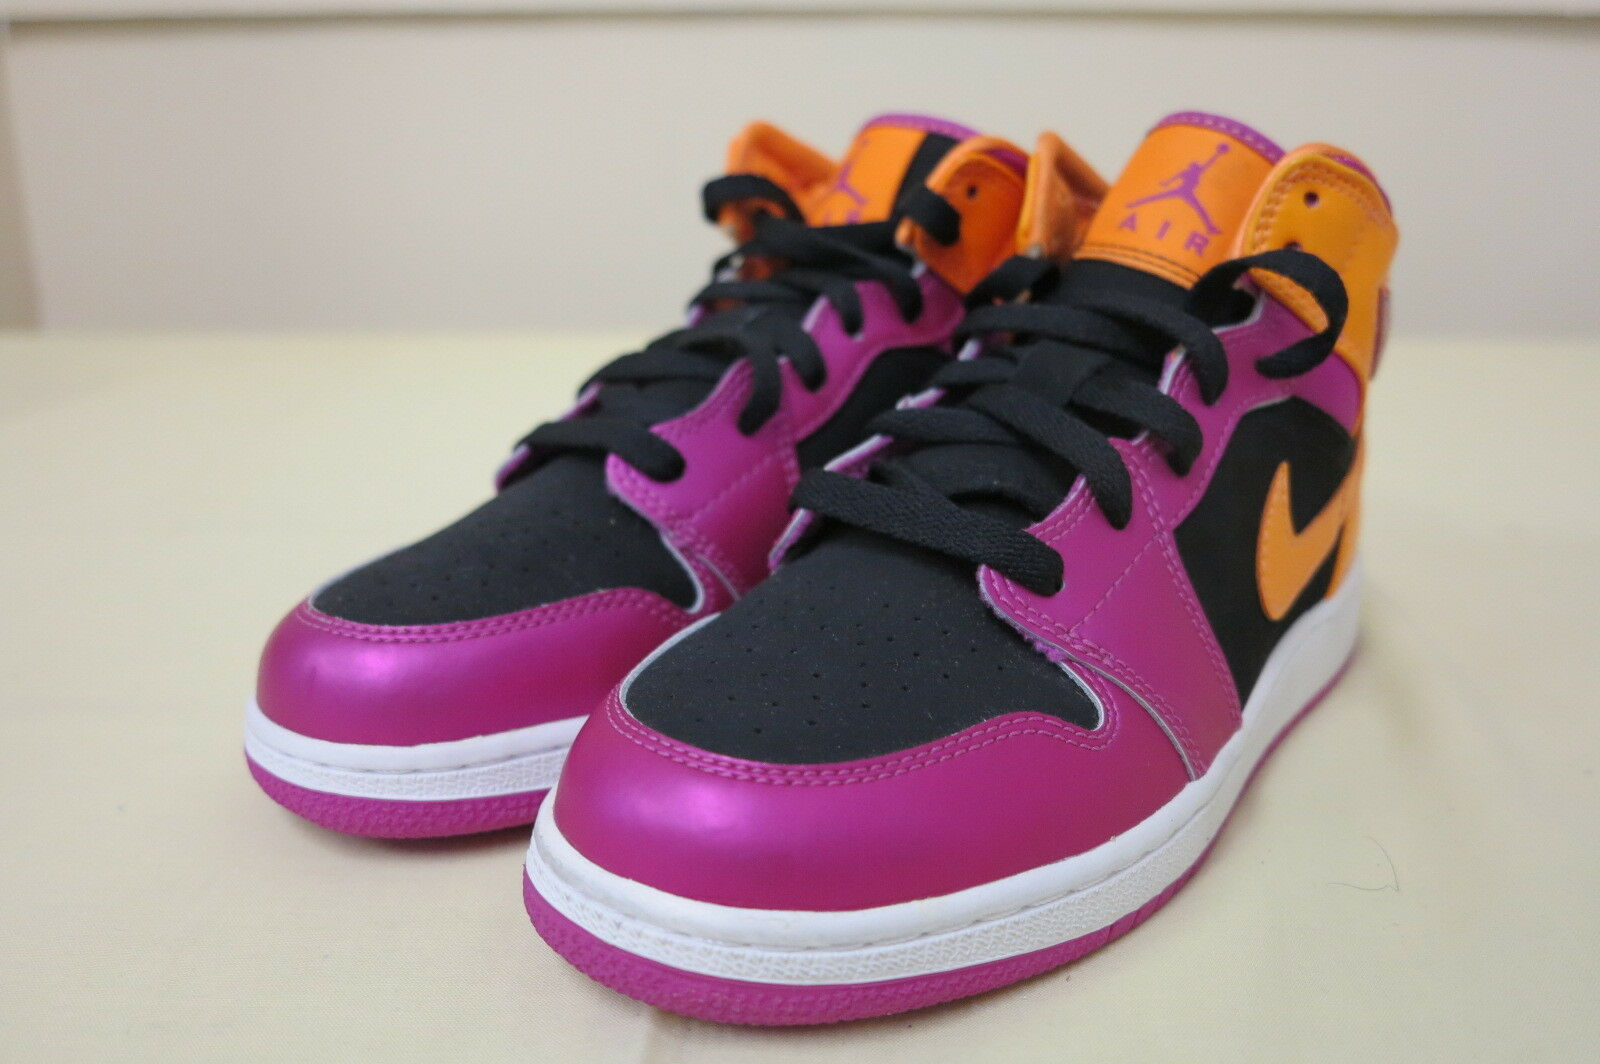 NIKE AIR JORDAN 1 damen GIRLS 4.5Y US UK4 EUR36.5 CM23.5 schwarz Rosa Orange NEW